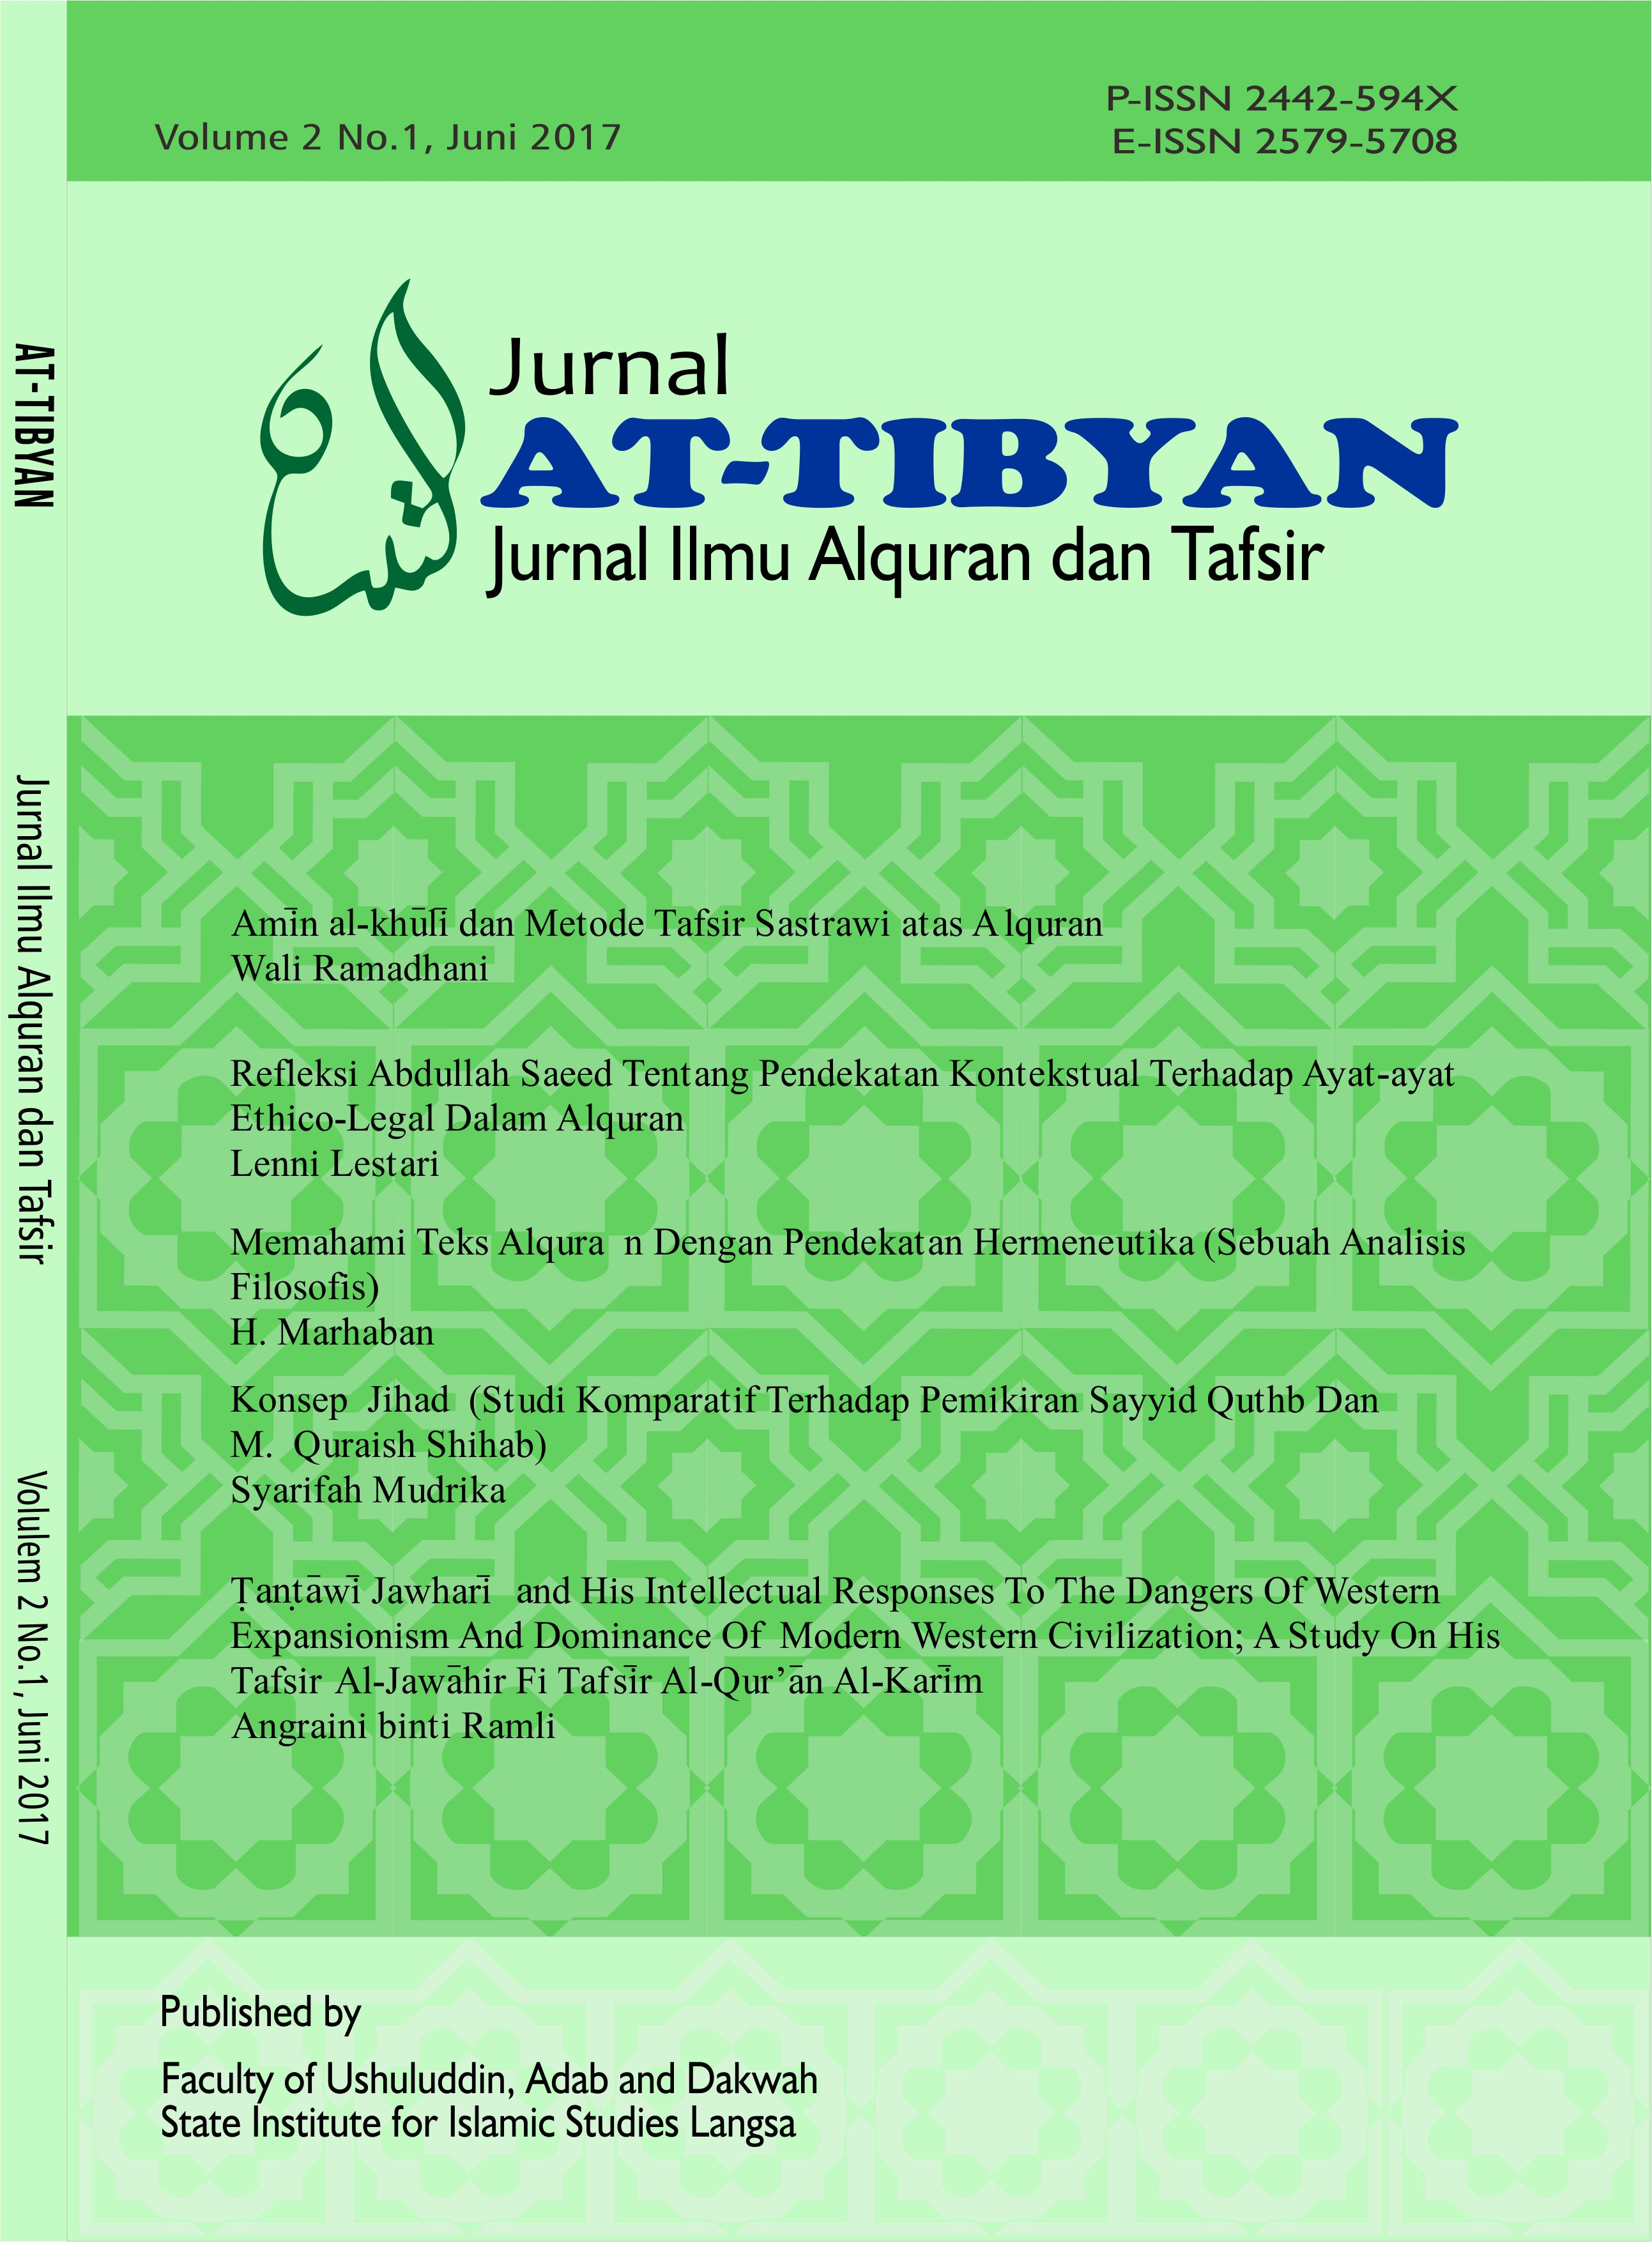 JURNAL AT-TIBYAN adalah Jurnal Ilmu Alquran dan Tafsir yang diterbitkan oleh Jur/Prodi Ilmu Alquran dan Tafsir Fakultas Ushuluddin, Adab, dan Dakwah IAIN Langsa. Jurnal ini diterbitkan dua kali dalam setahun yaitu pada bulan Juli dan Desember. Jurnal ini memiliki spesifikasi keilmiahan dan publikasi serta mengkomunikasikan hasil penelitian-penelitian para dosen dan praktisi yang berkaitan dengan ruang lingkup studi ilmu-ilmu Al-Quran dan tafsir.